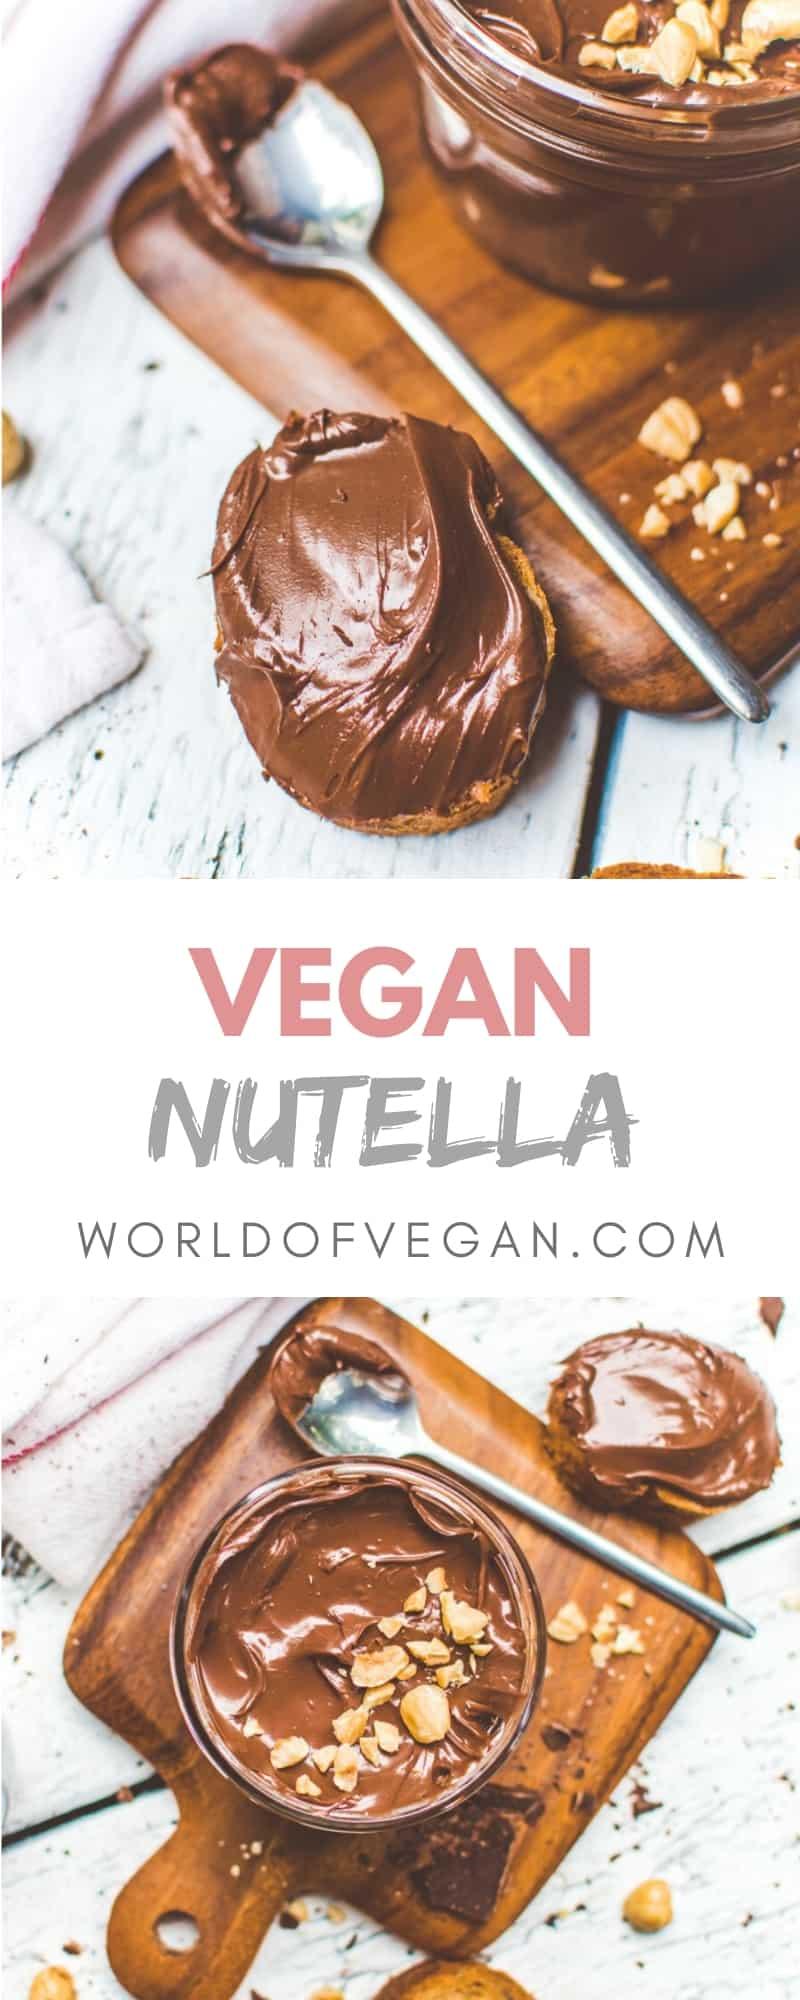 Homemade Vegan Nutella | Chocolate Spread | World of Vegan | #nutella #vegan #recipe #homemade #diy #chocolate #hazelnuts #worldofvegan